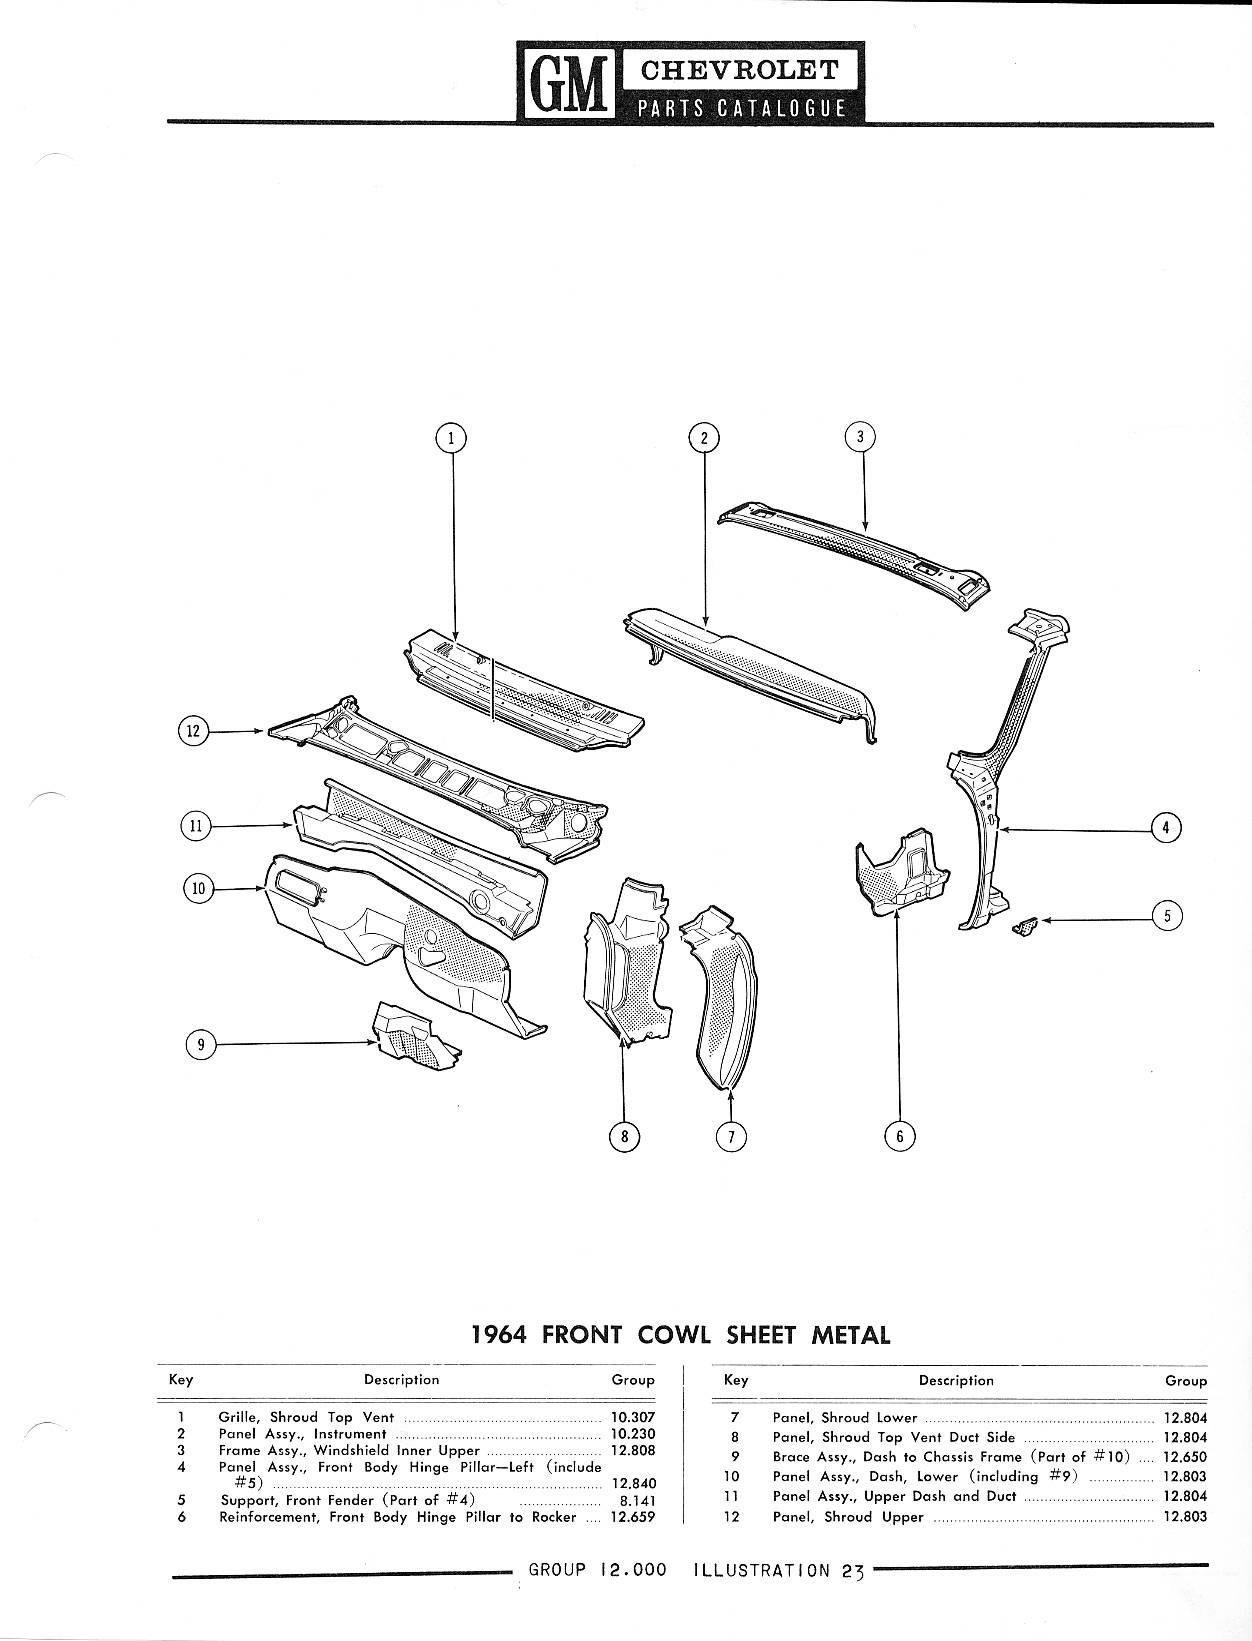 1958-1968 Chevrolet Parts Catalog / Image179.jpg